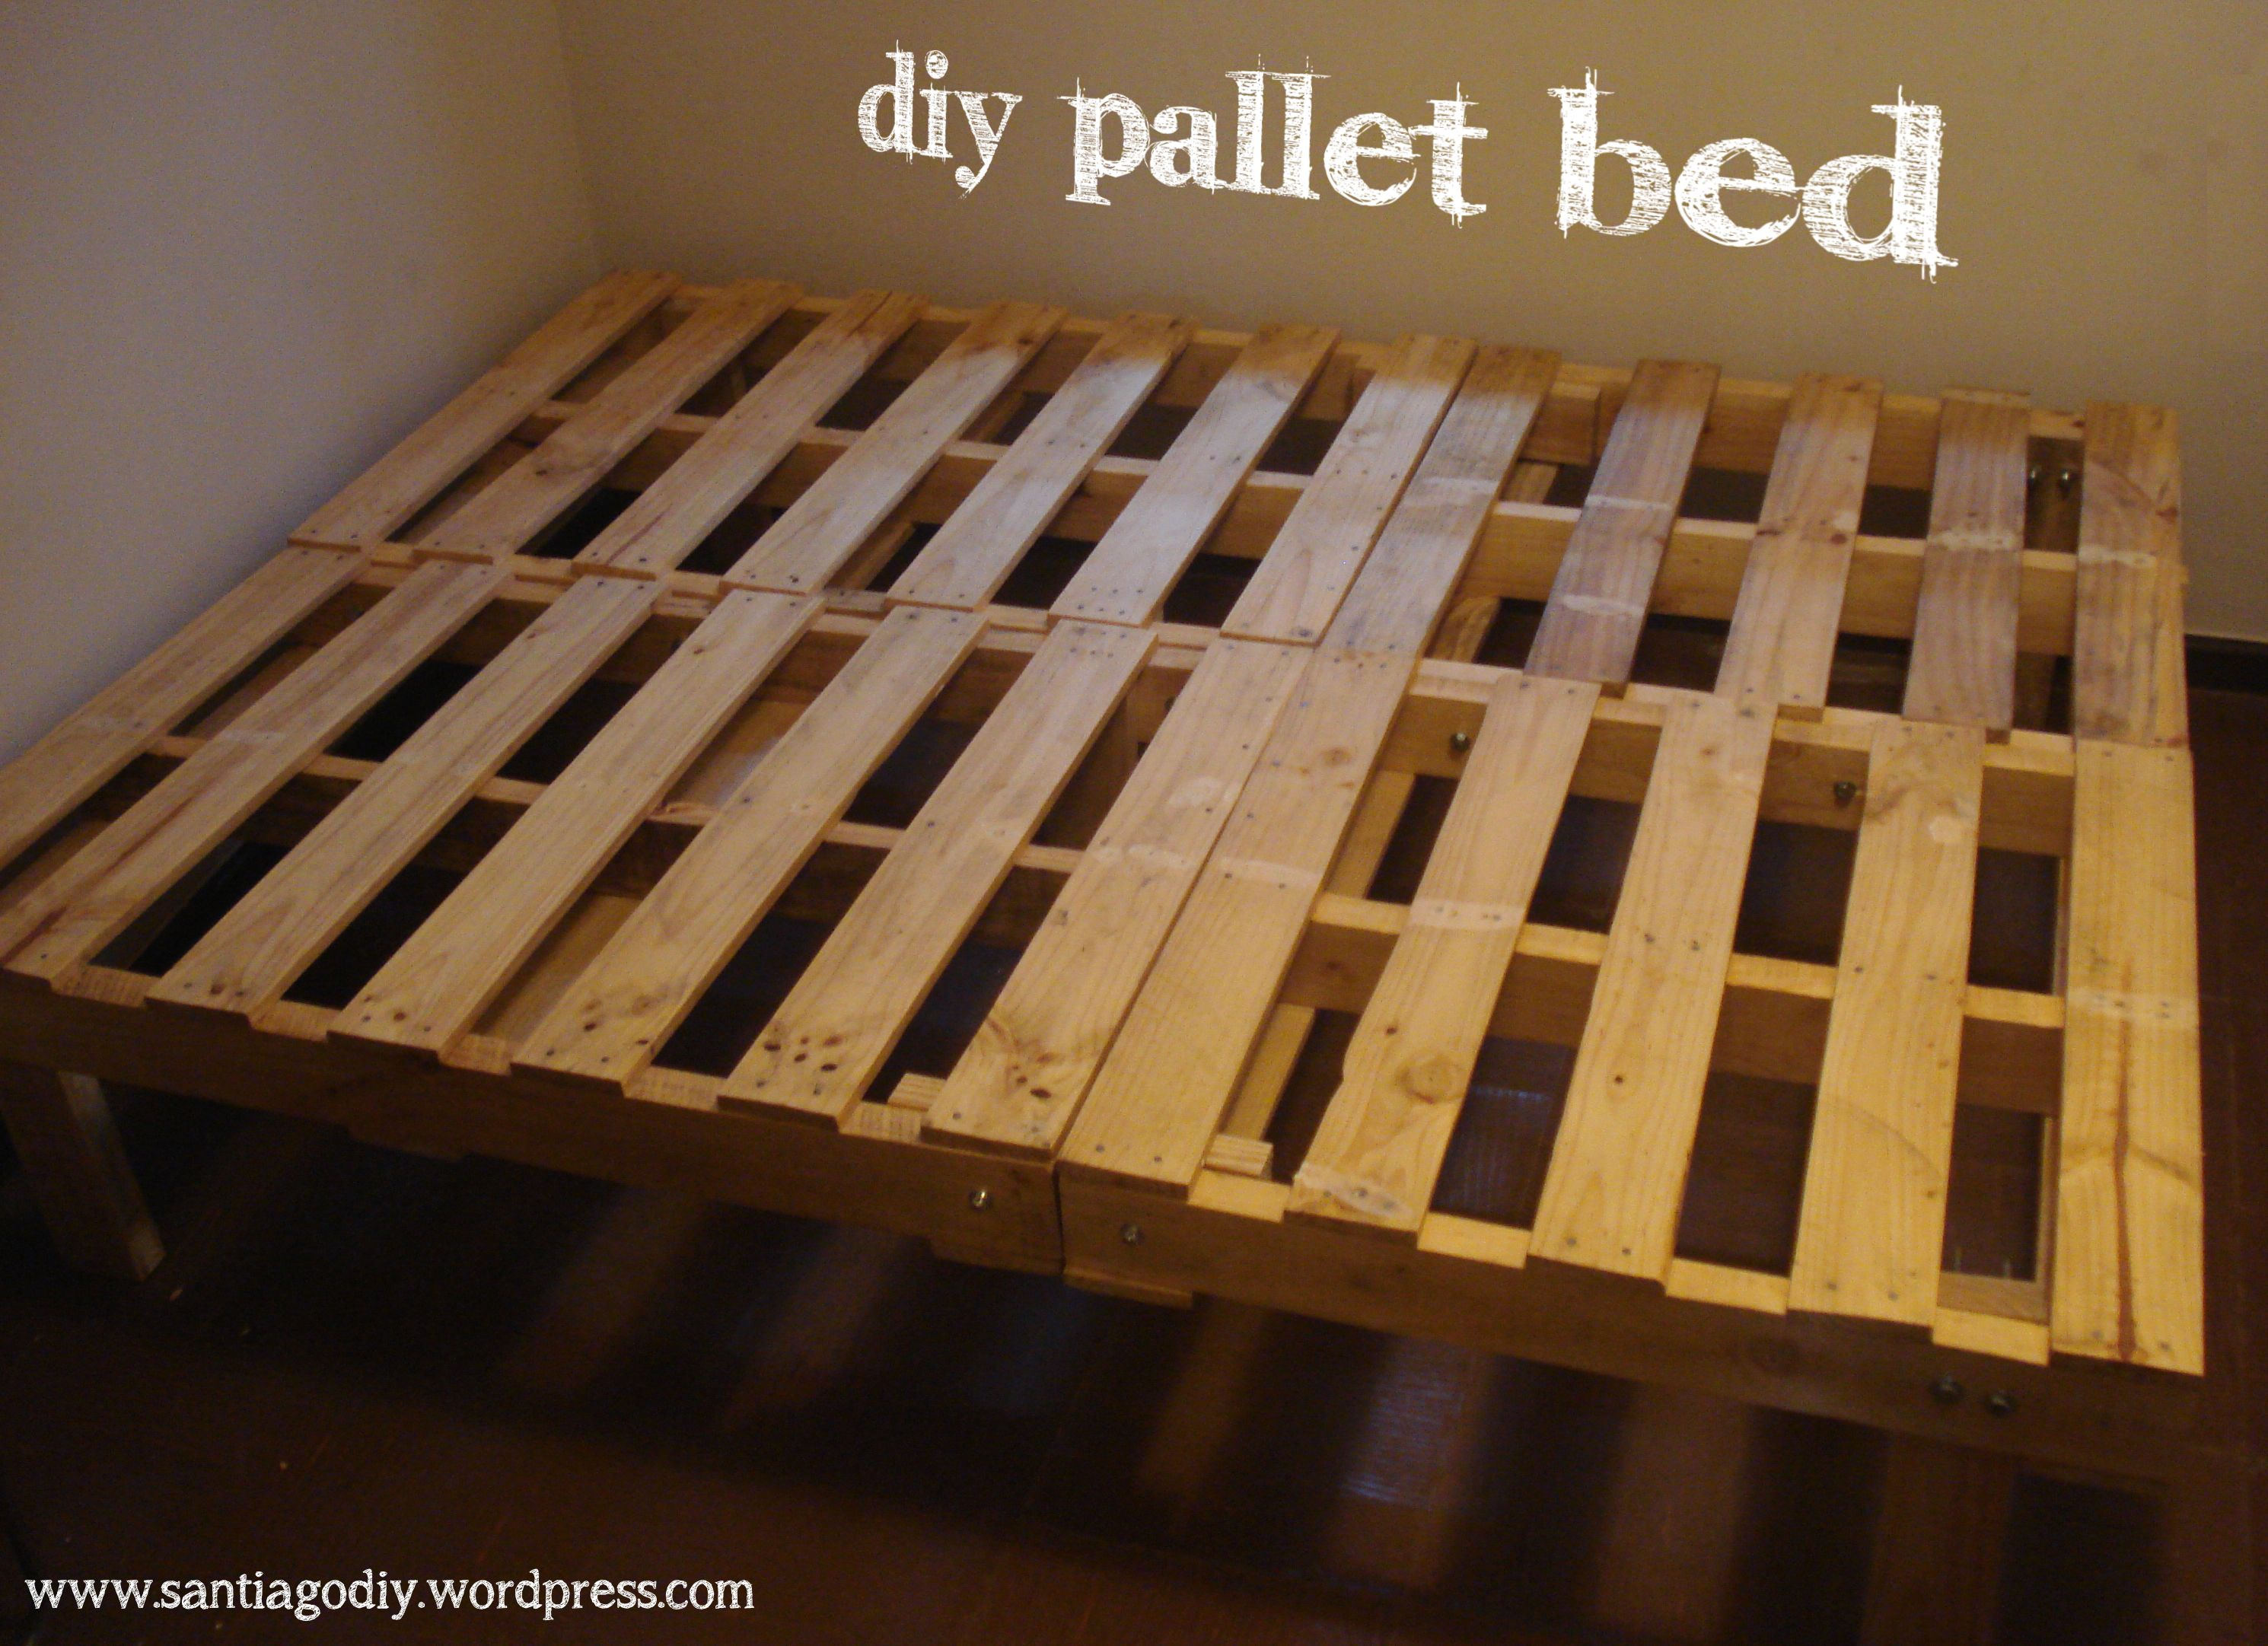 How To Make A Bed From Pallets Http Www Thebudgetdecorator Com Wp Content Uploads 2014 06 2d30ad8132d19a860ee Diy Pallet Bed Diy Bed Frame Diy Platform Bed